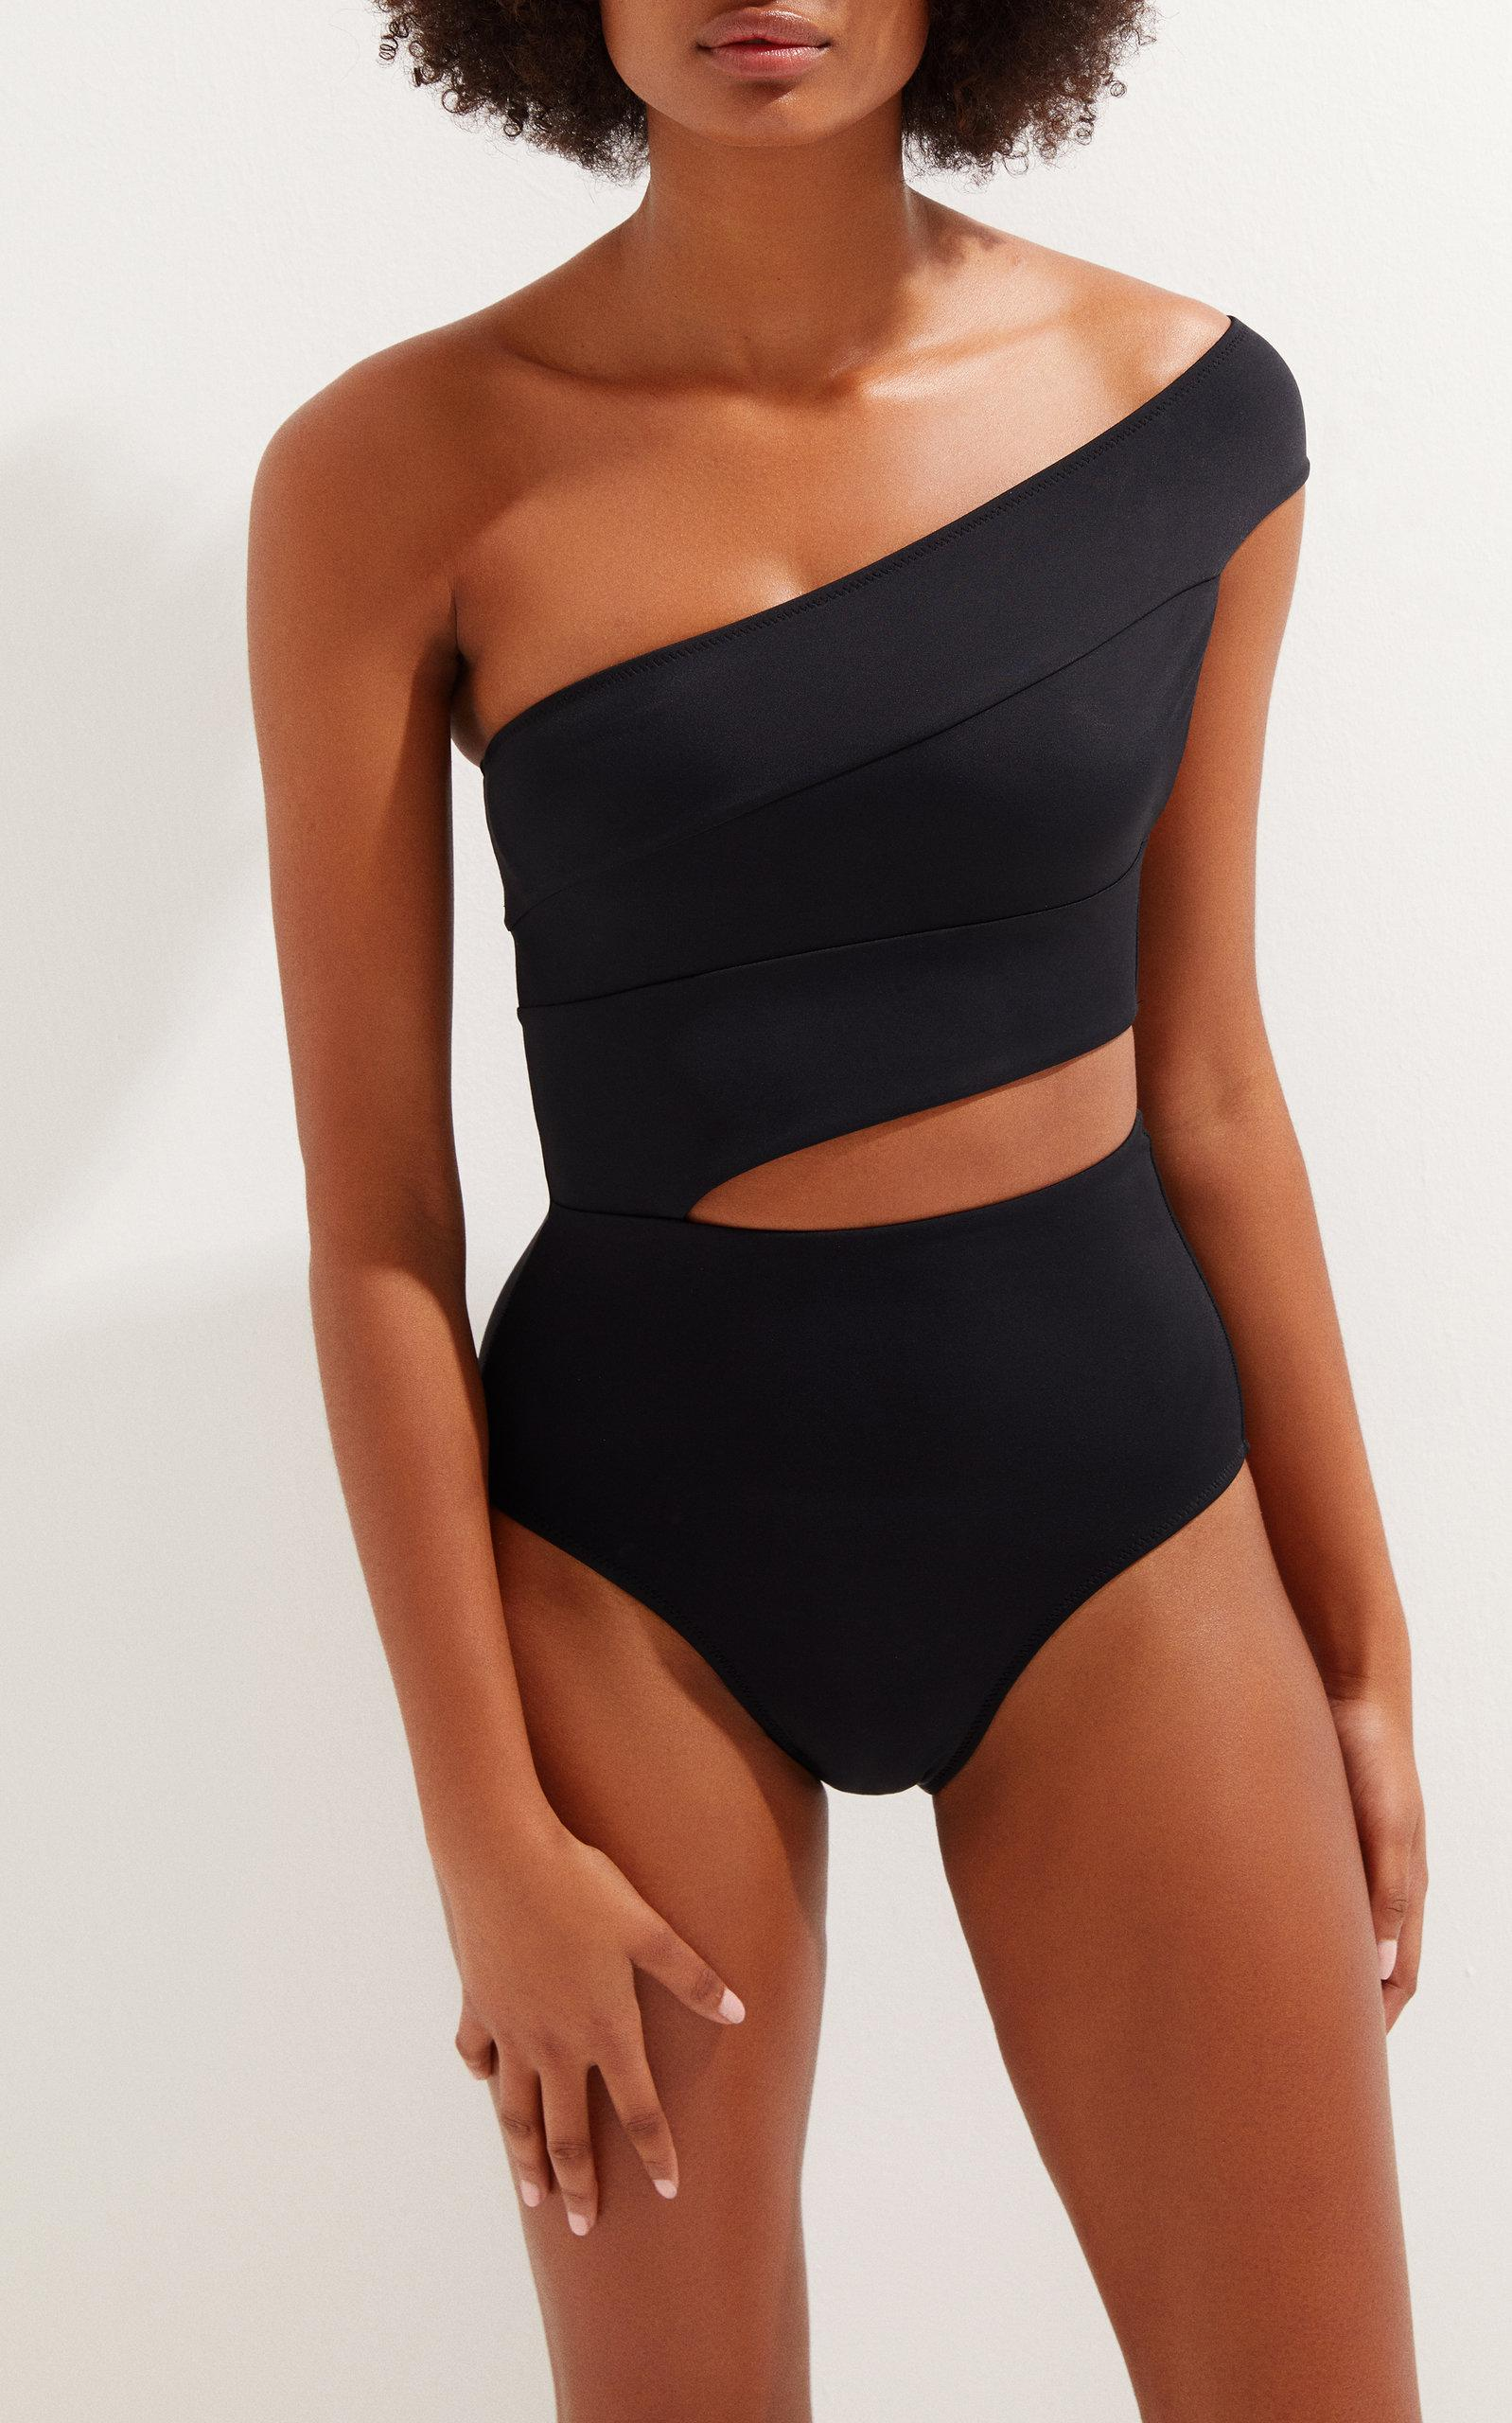 0045e3709e Lyst - OYE Swimwear Veronique One Shoulder Suit in Black